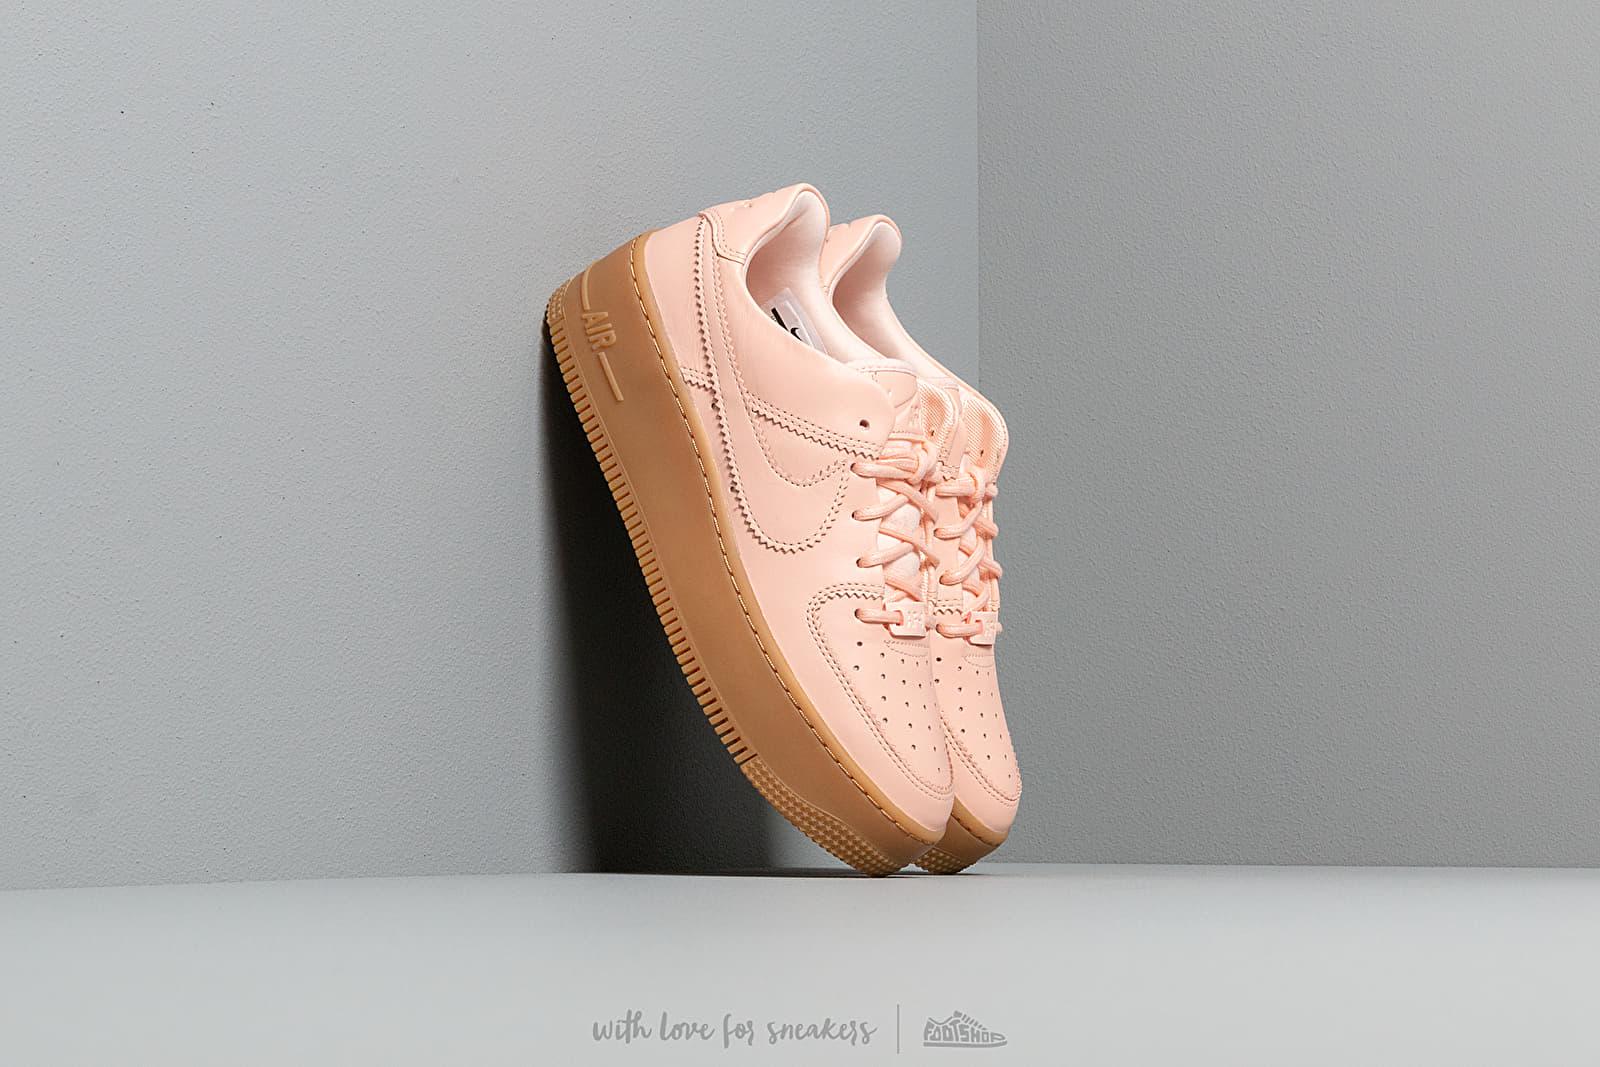 Nike W Air Force 1 Sage Low Lx Washed Coral/ Washed Coral za skvelú cenu 110 € kúpite na Footshop.sk